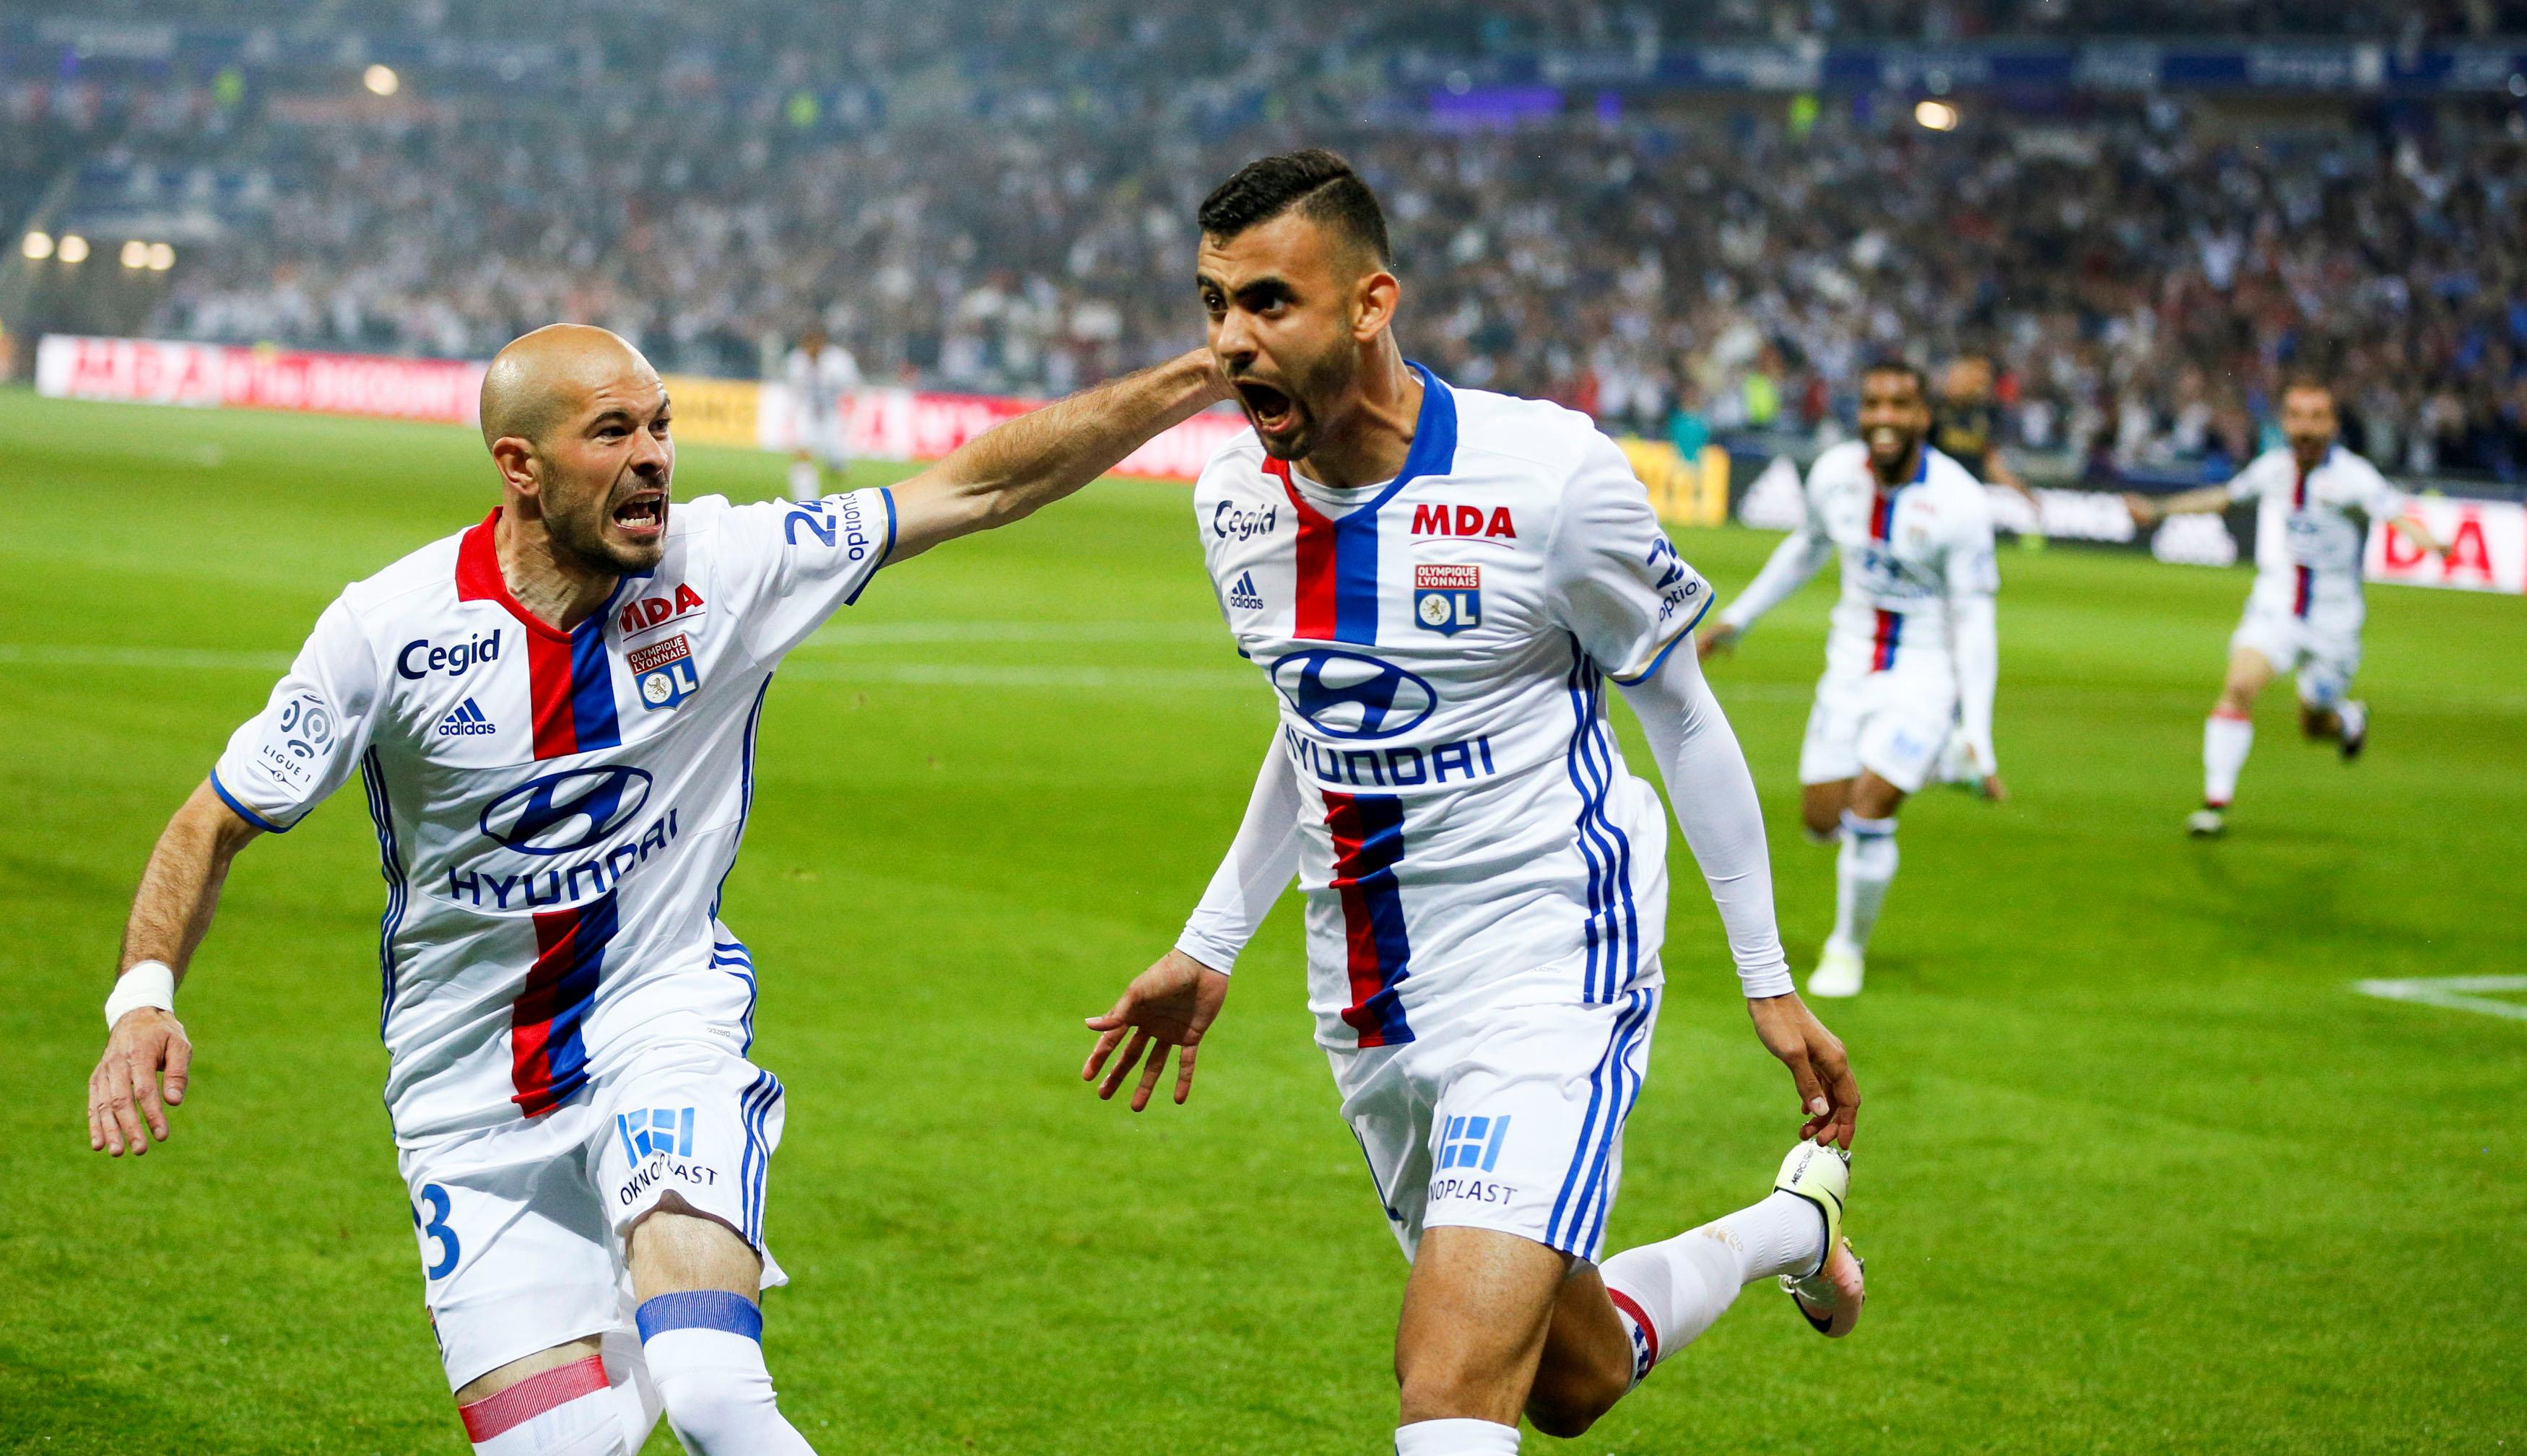 Olympique Lione vs Monaco - Ligue 1